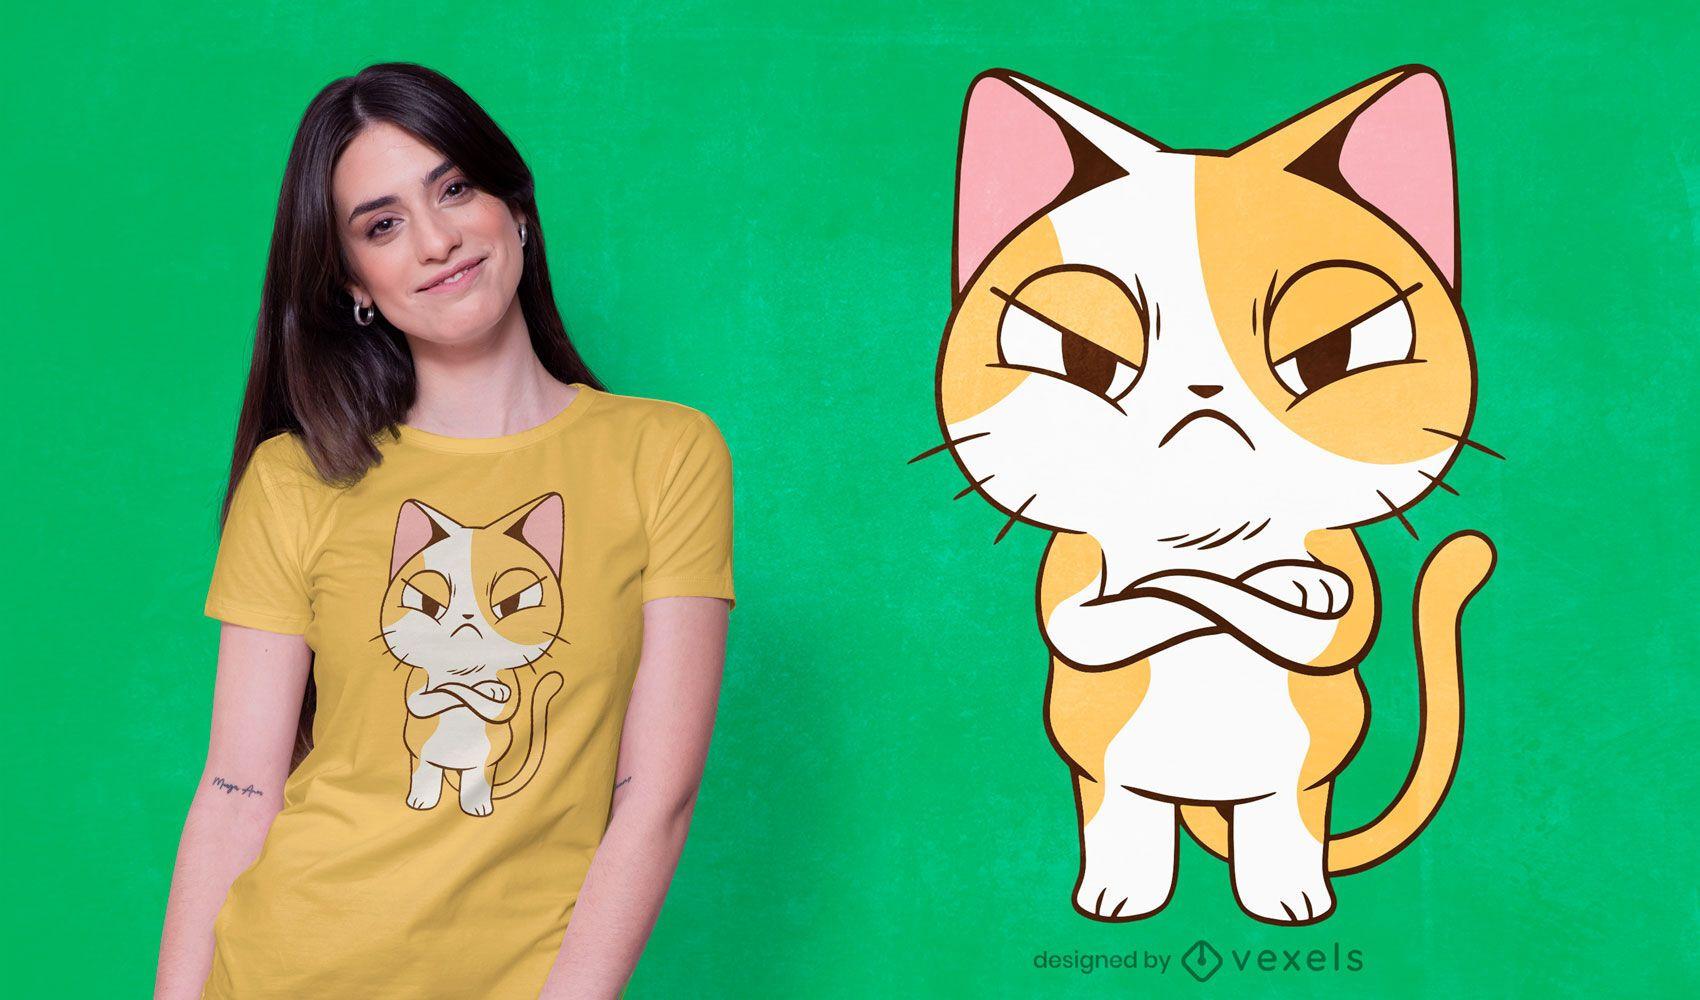 Angry kitten t-shirt design